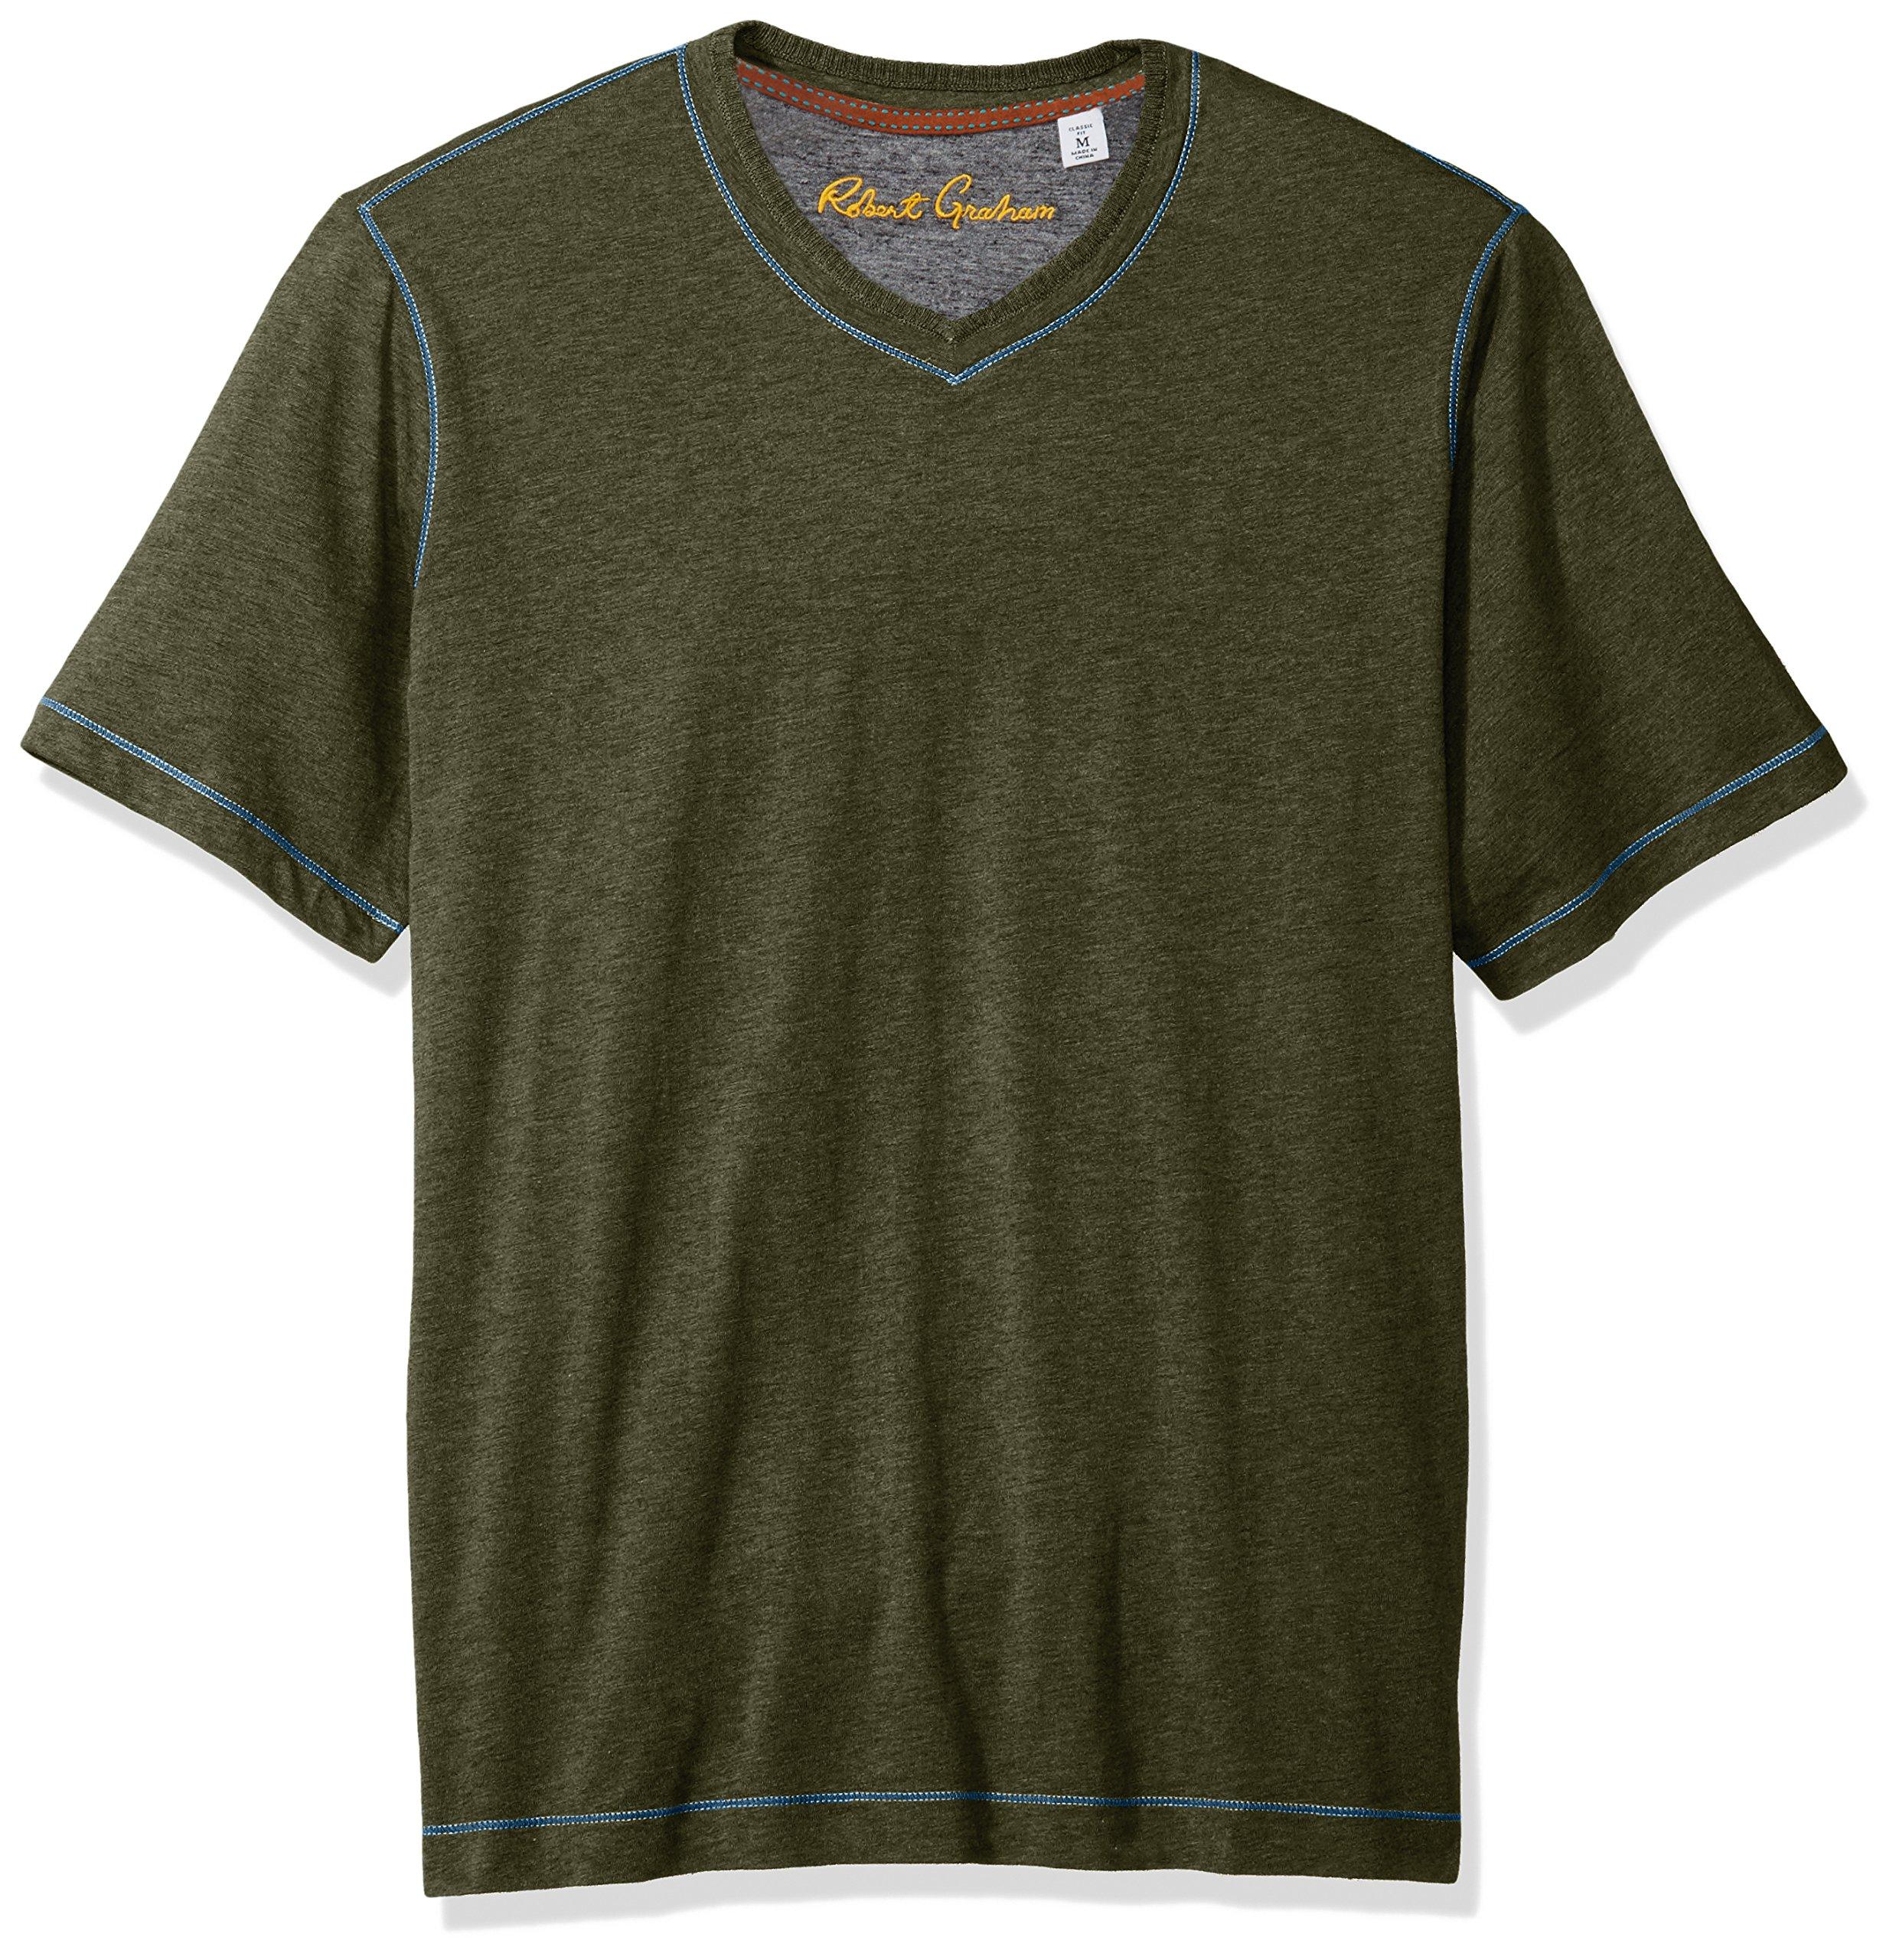 Robert Graham Men's Short Sleeve Classic Fit Jersey Tee Shirt, Heather Olive, XLarge